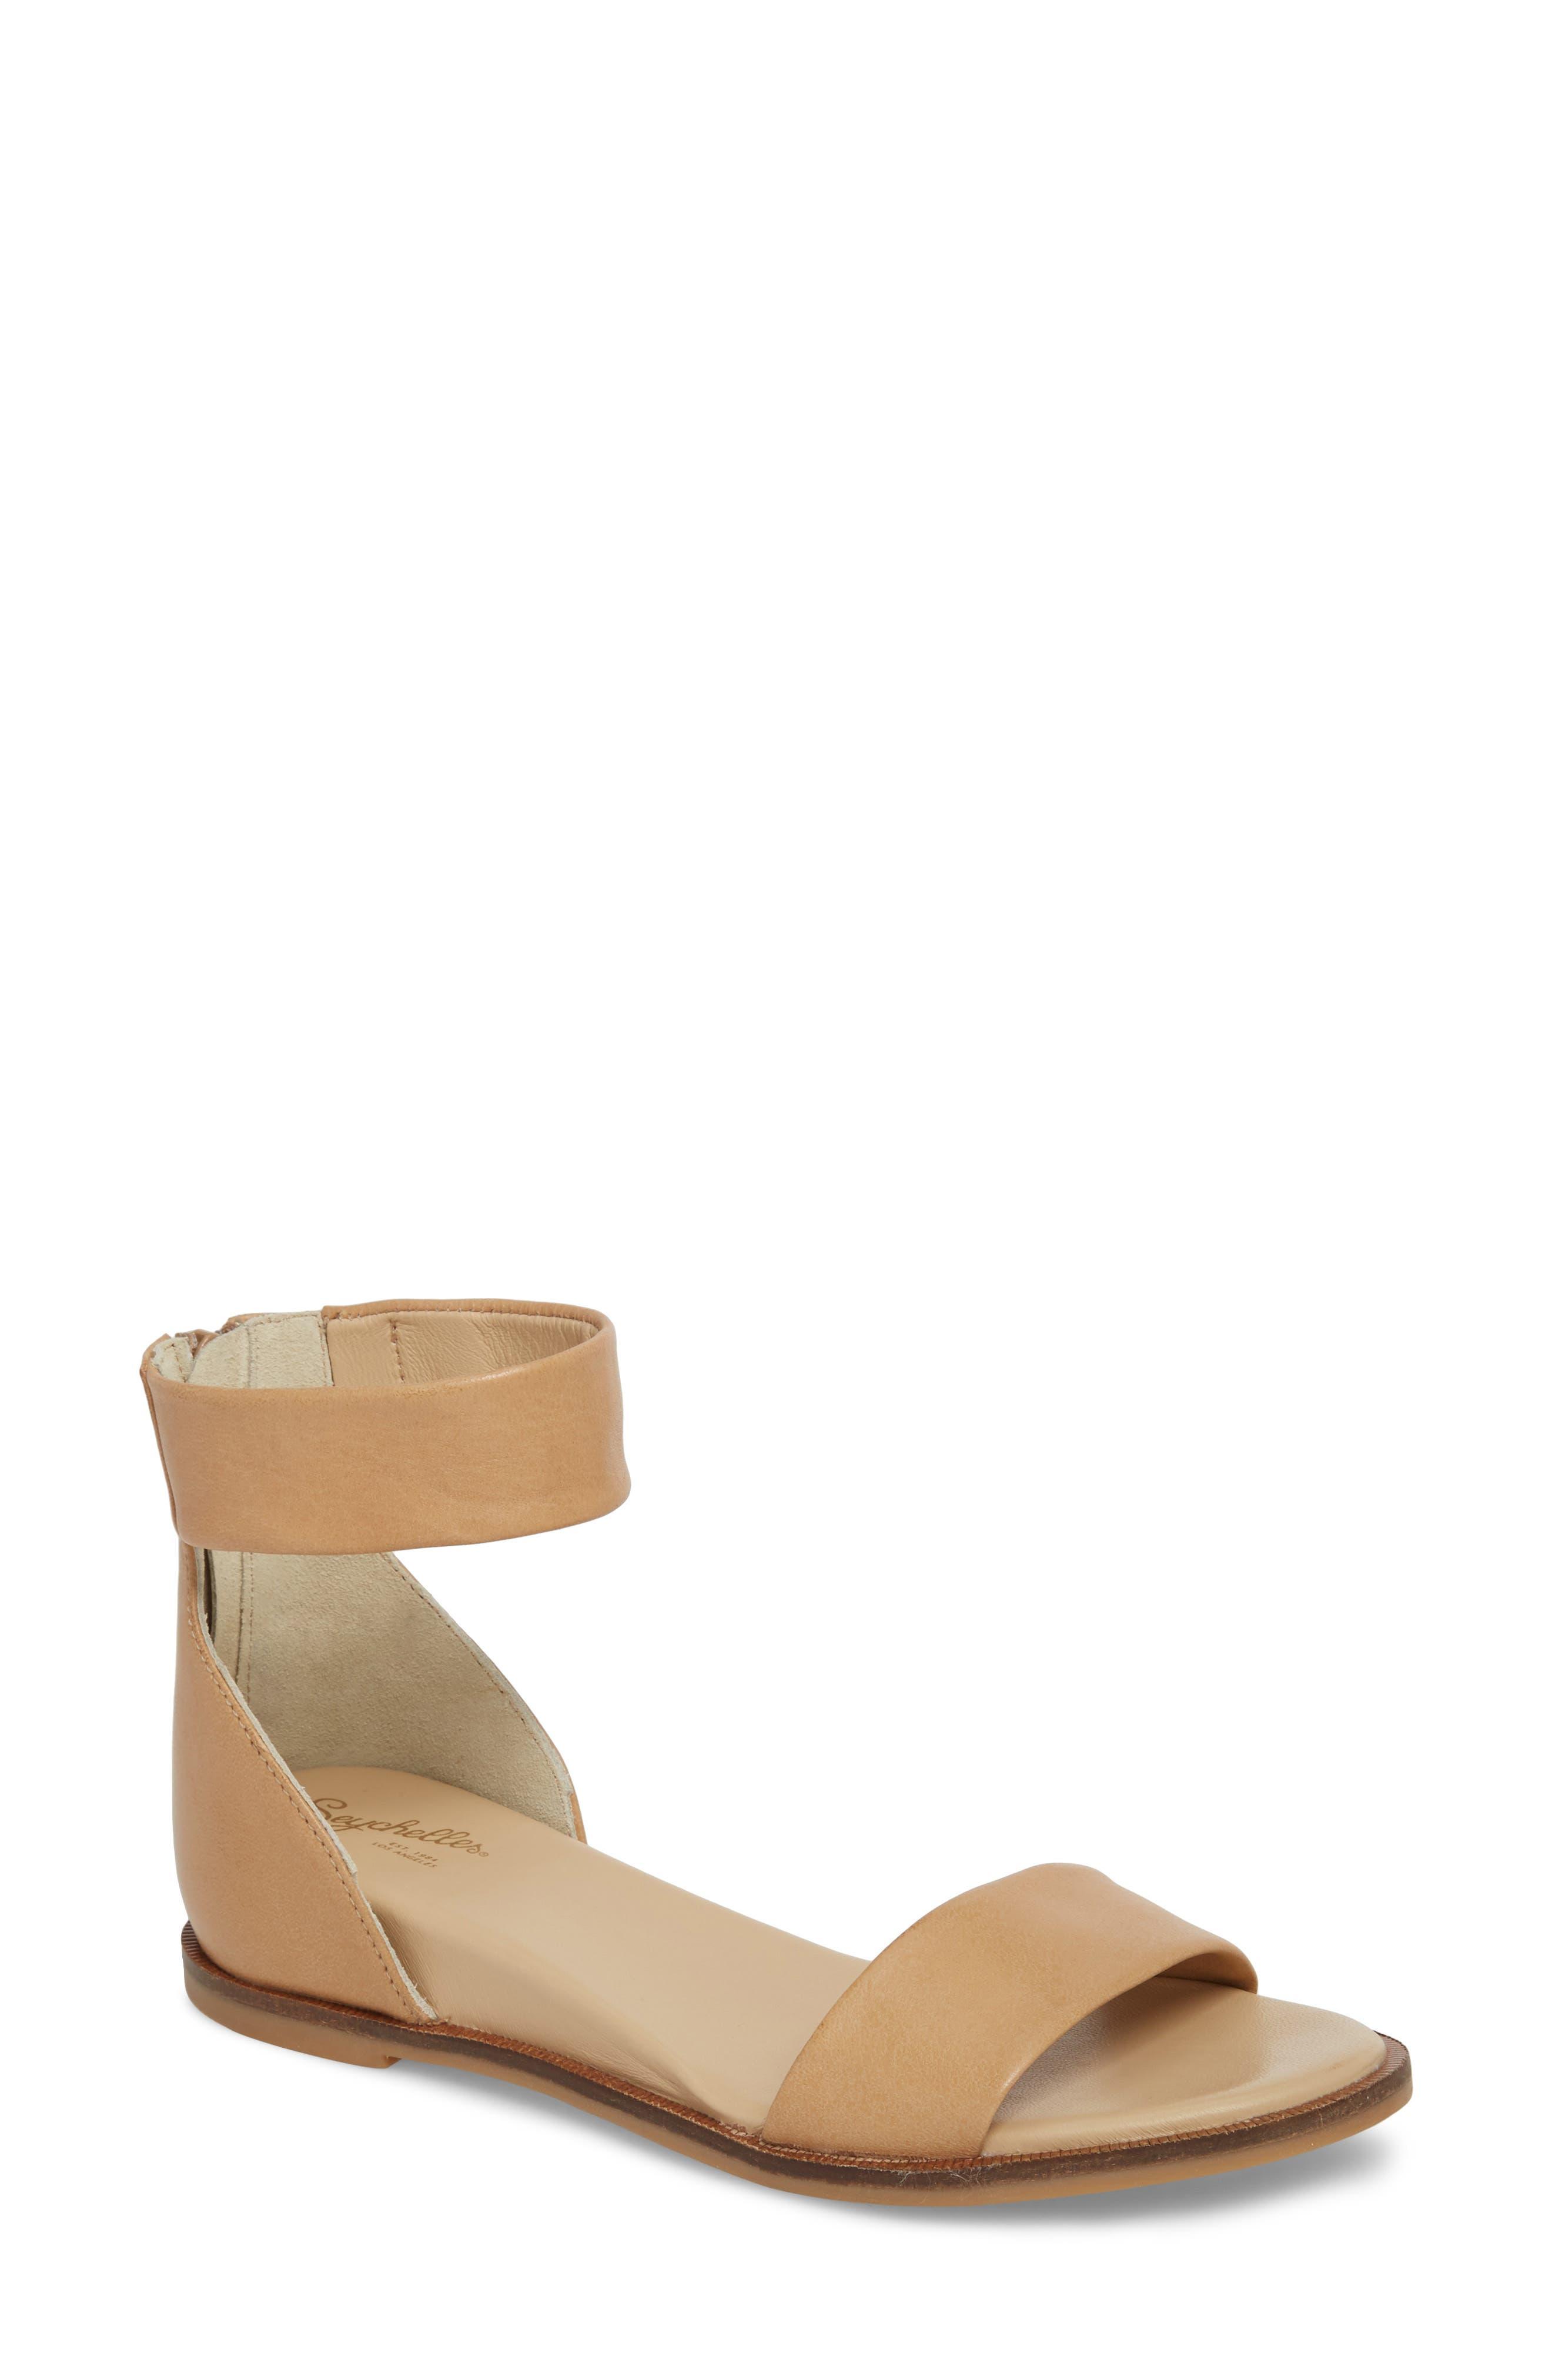 Ankle Strap Sandal,                         Main,                         color, VACCHETTA LEATHER